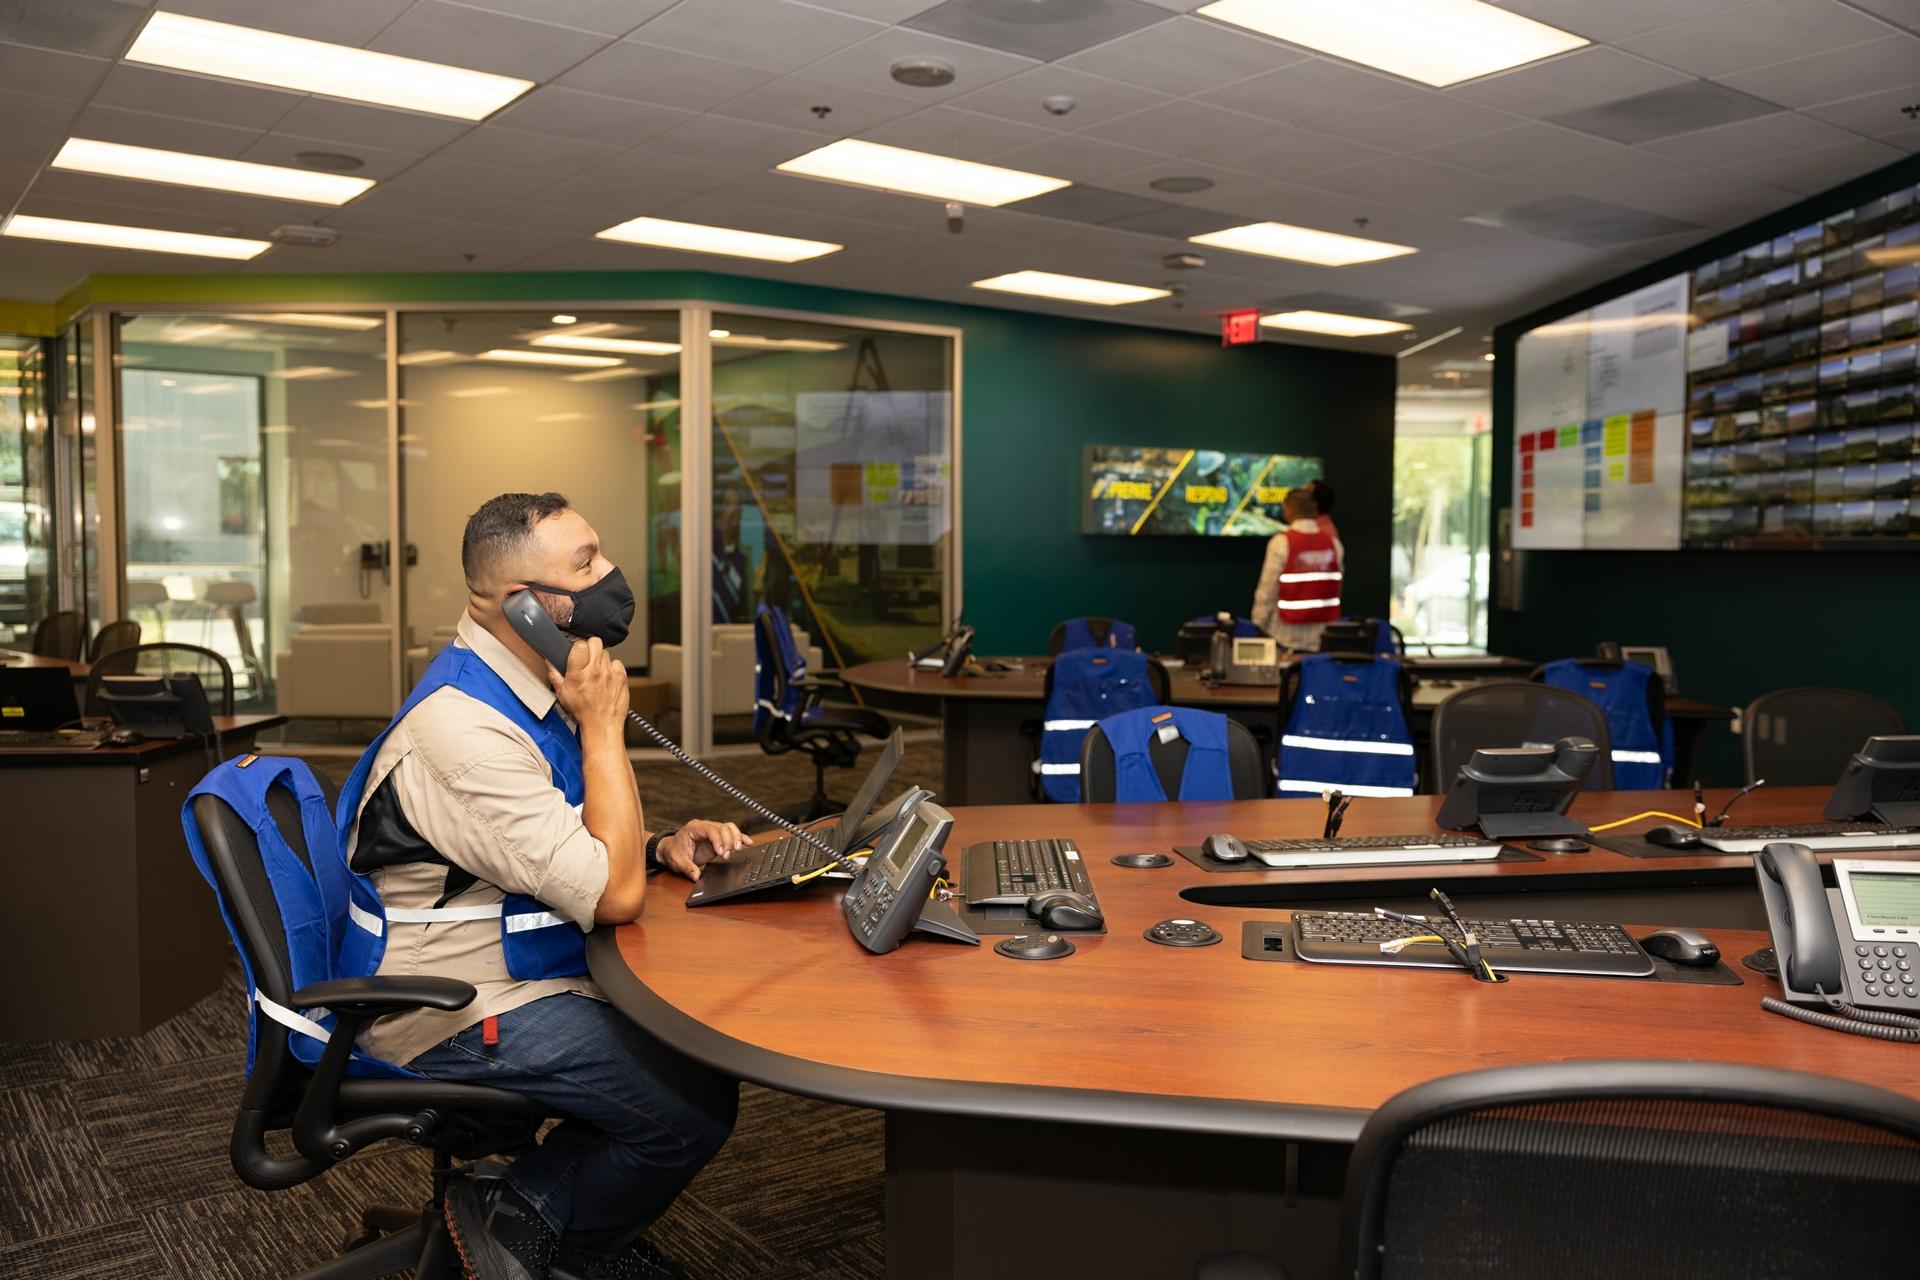 Pedro Ruiz, SCE Business Resiliency advisor, monitors a screen for information.